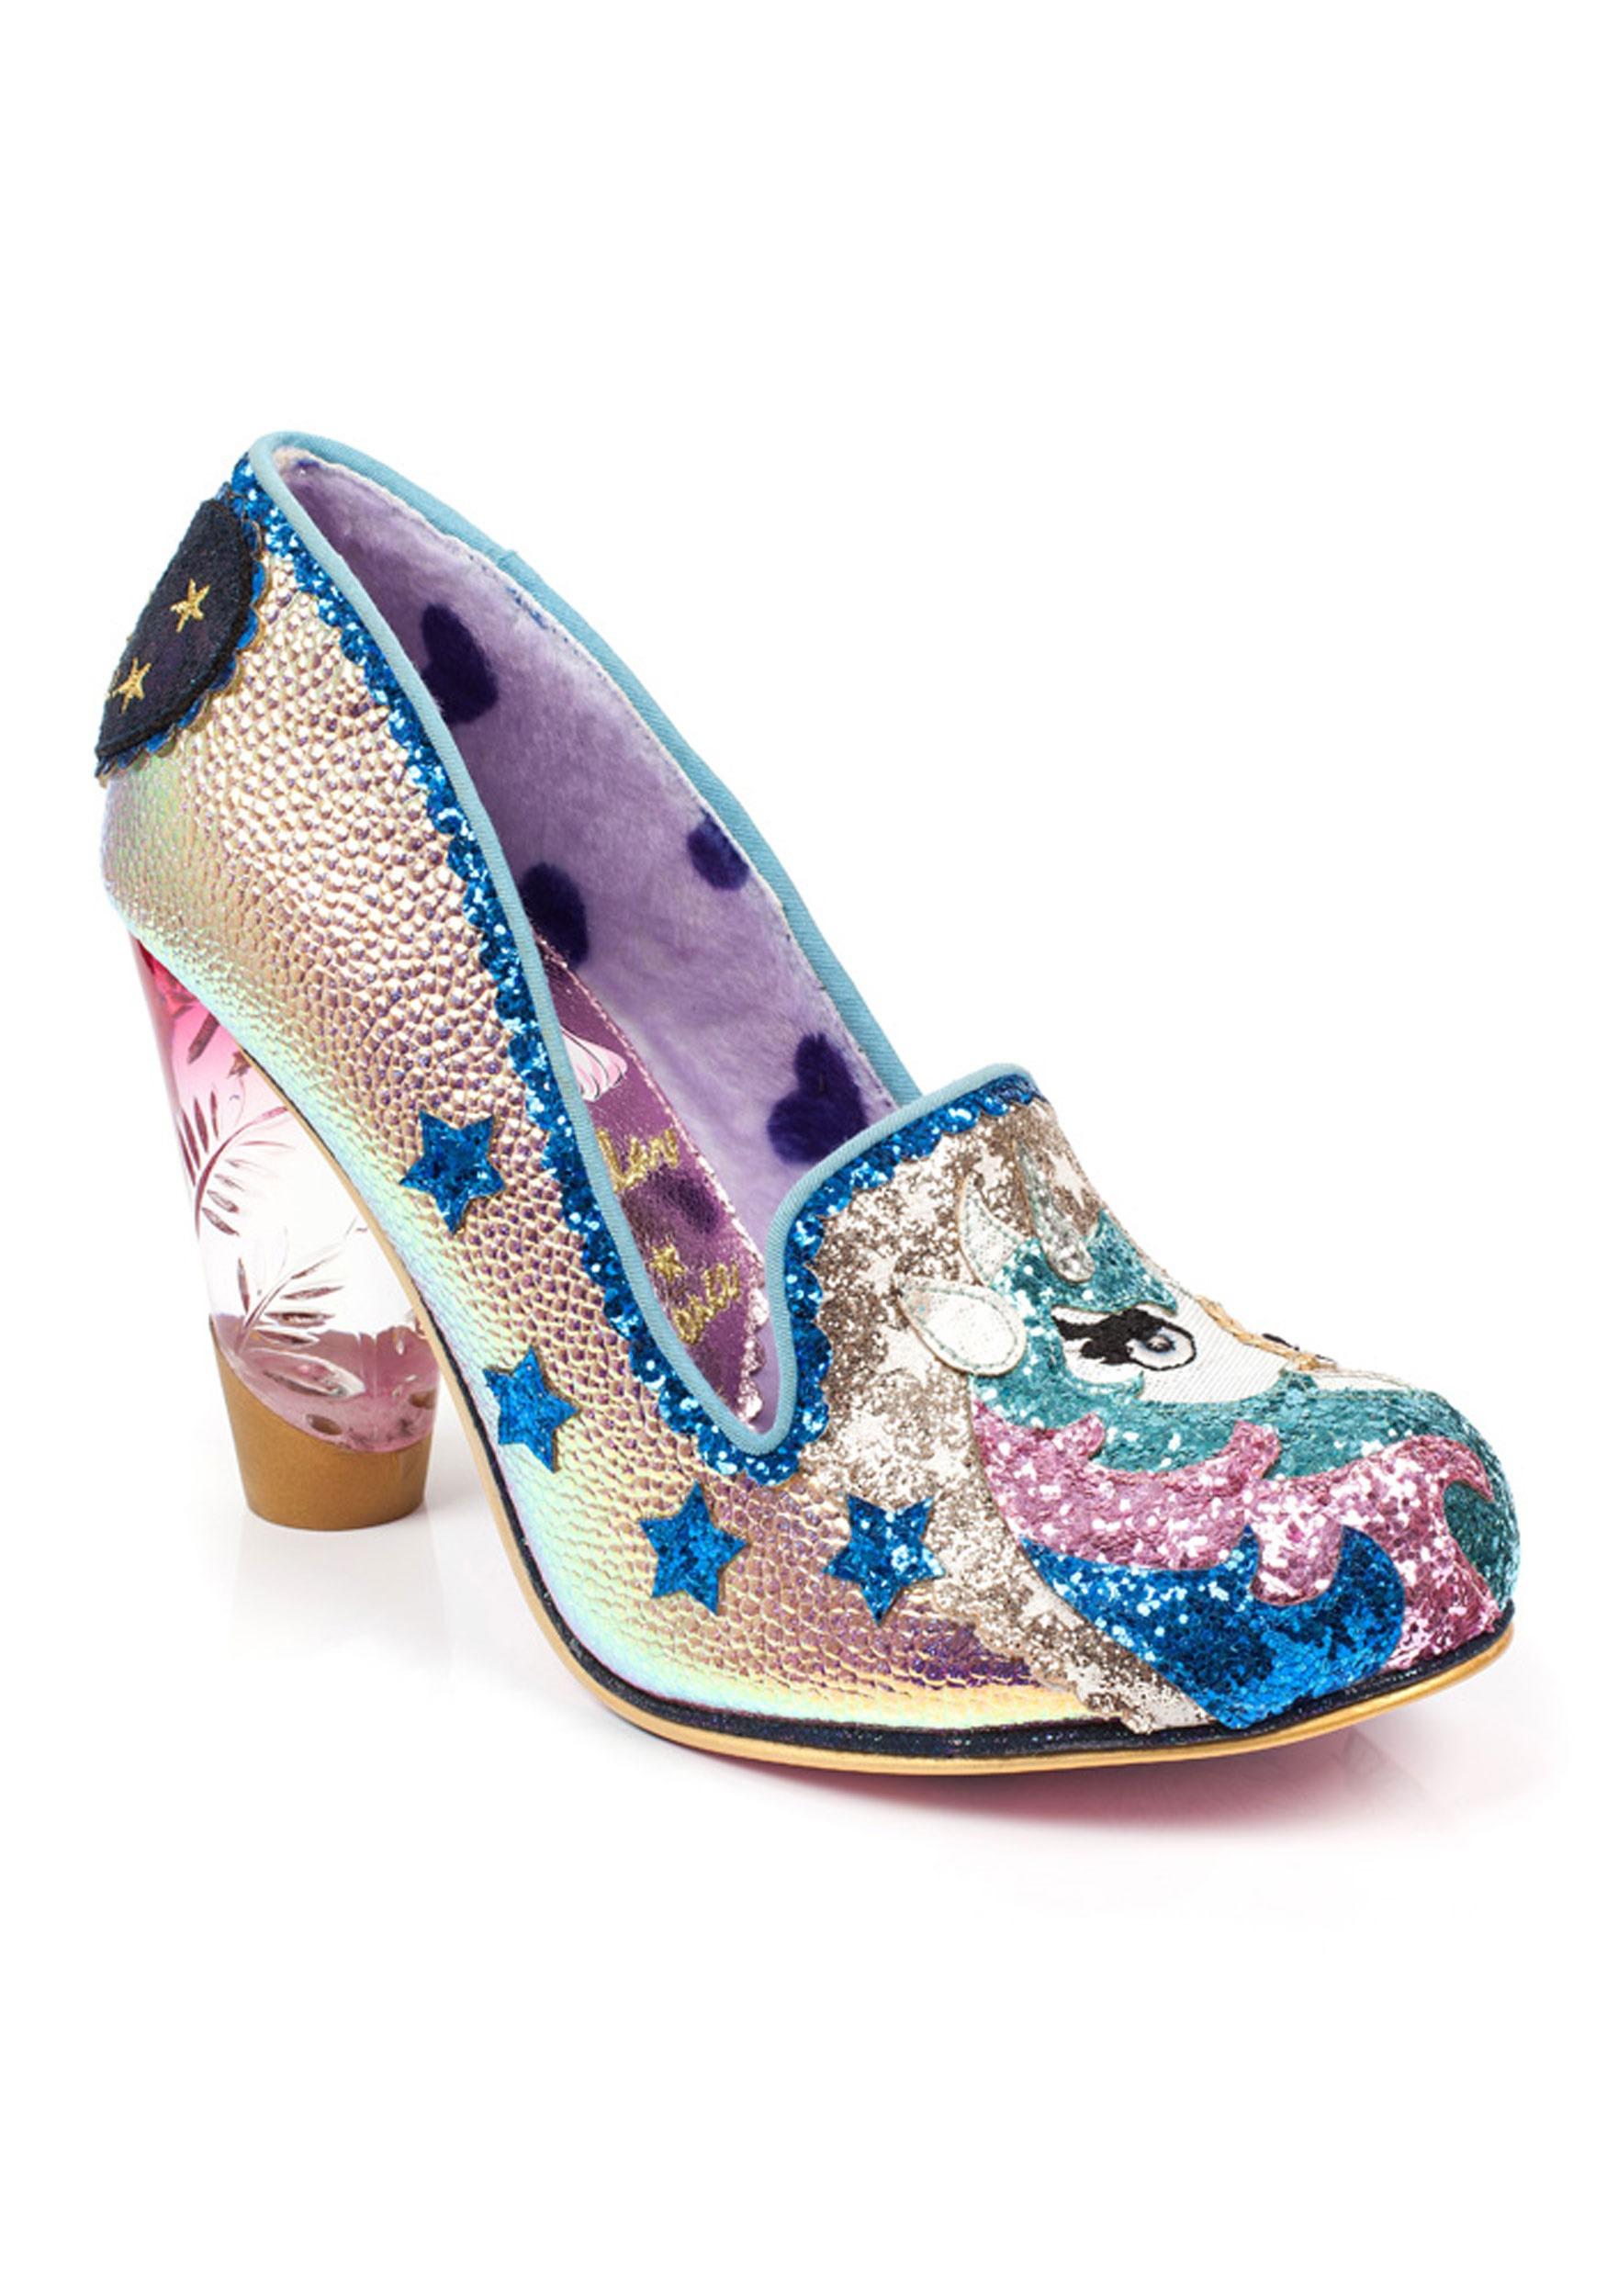 fe6ba0dc7a5 Irregular Choice Lady Misty Unicorn High Heels